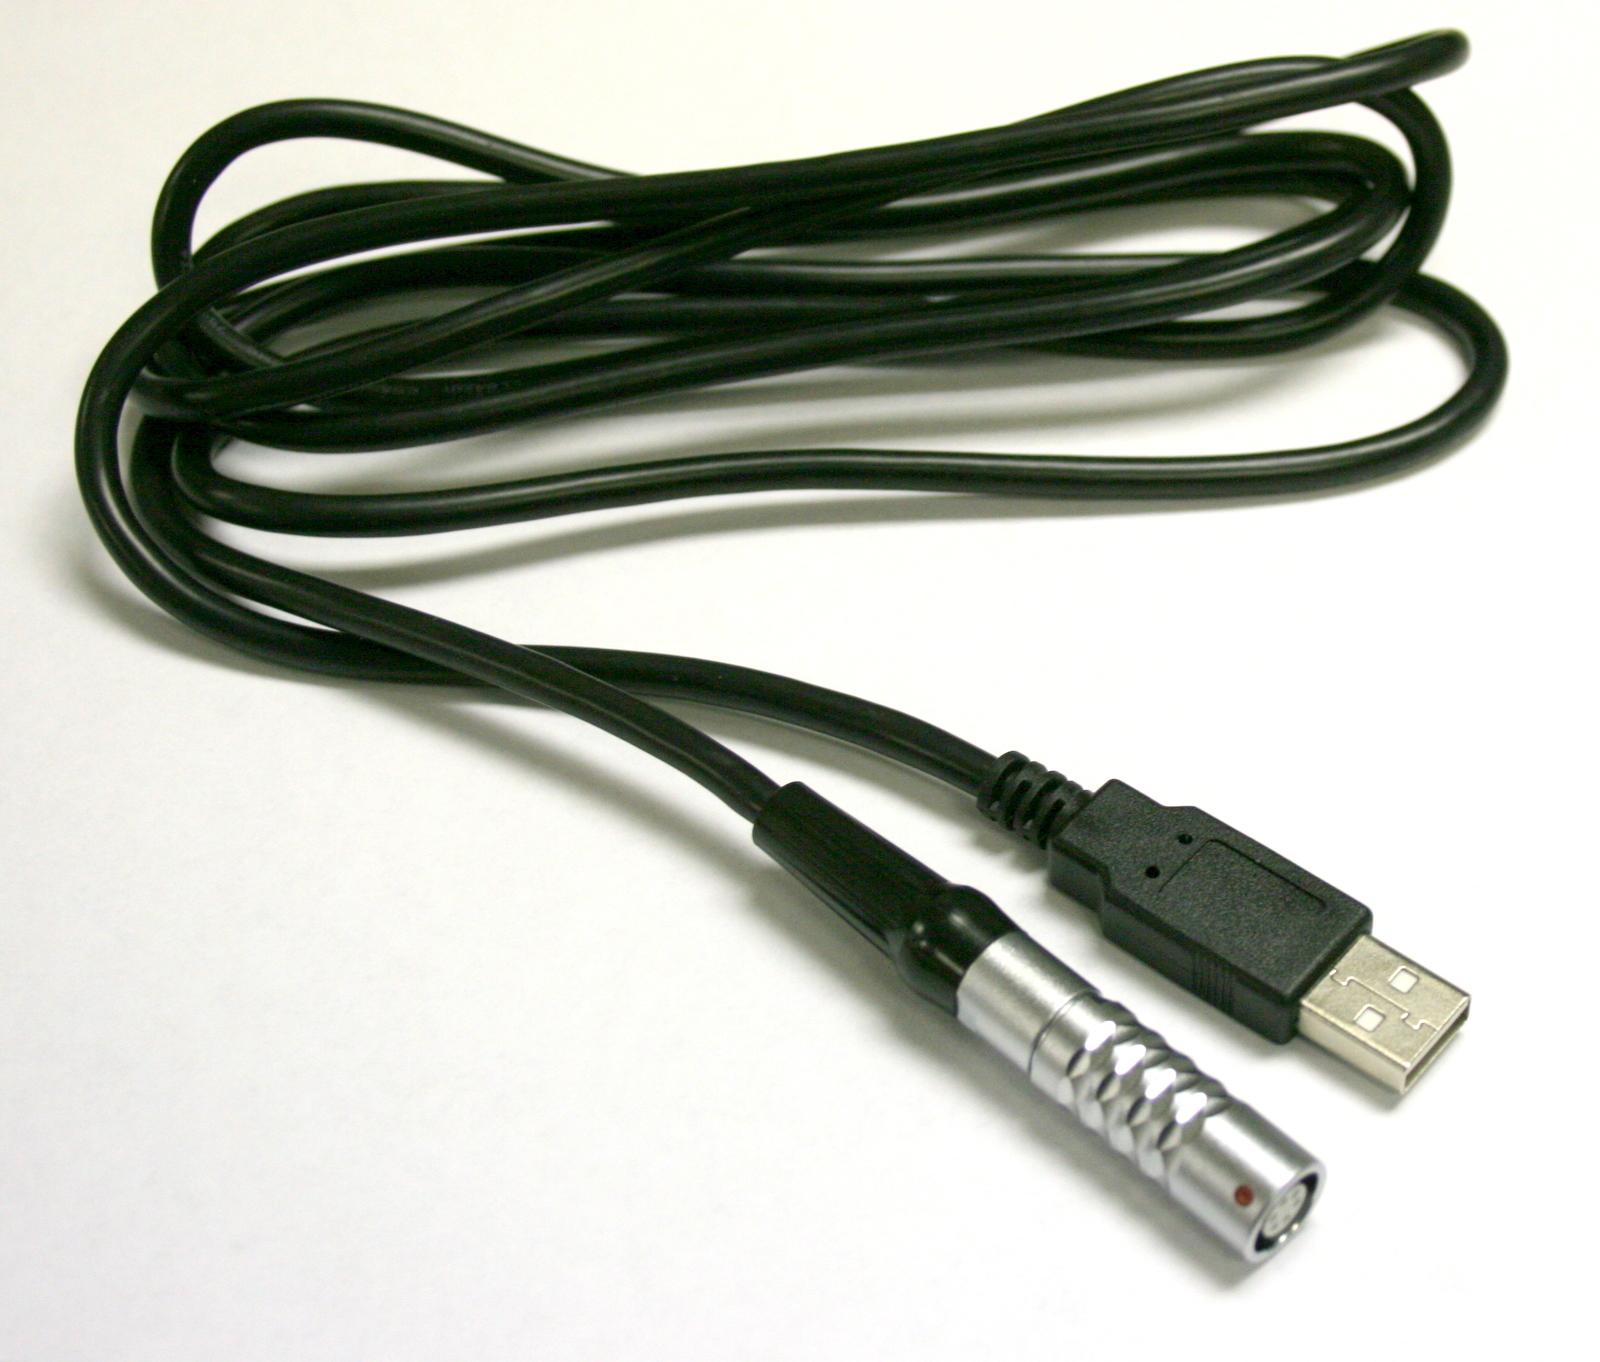 rohde-schwarz-nrp-z4-usb-adapter-passive-for-nrp-z-sensors-powered-via-usb